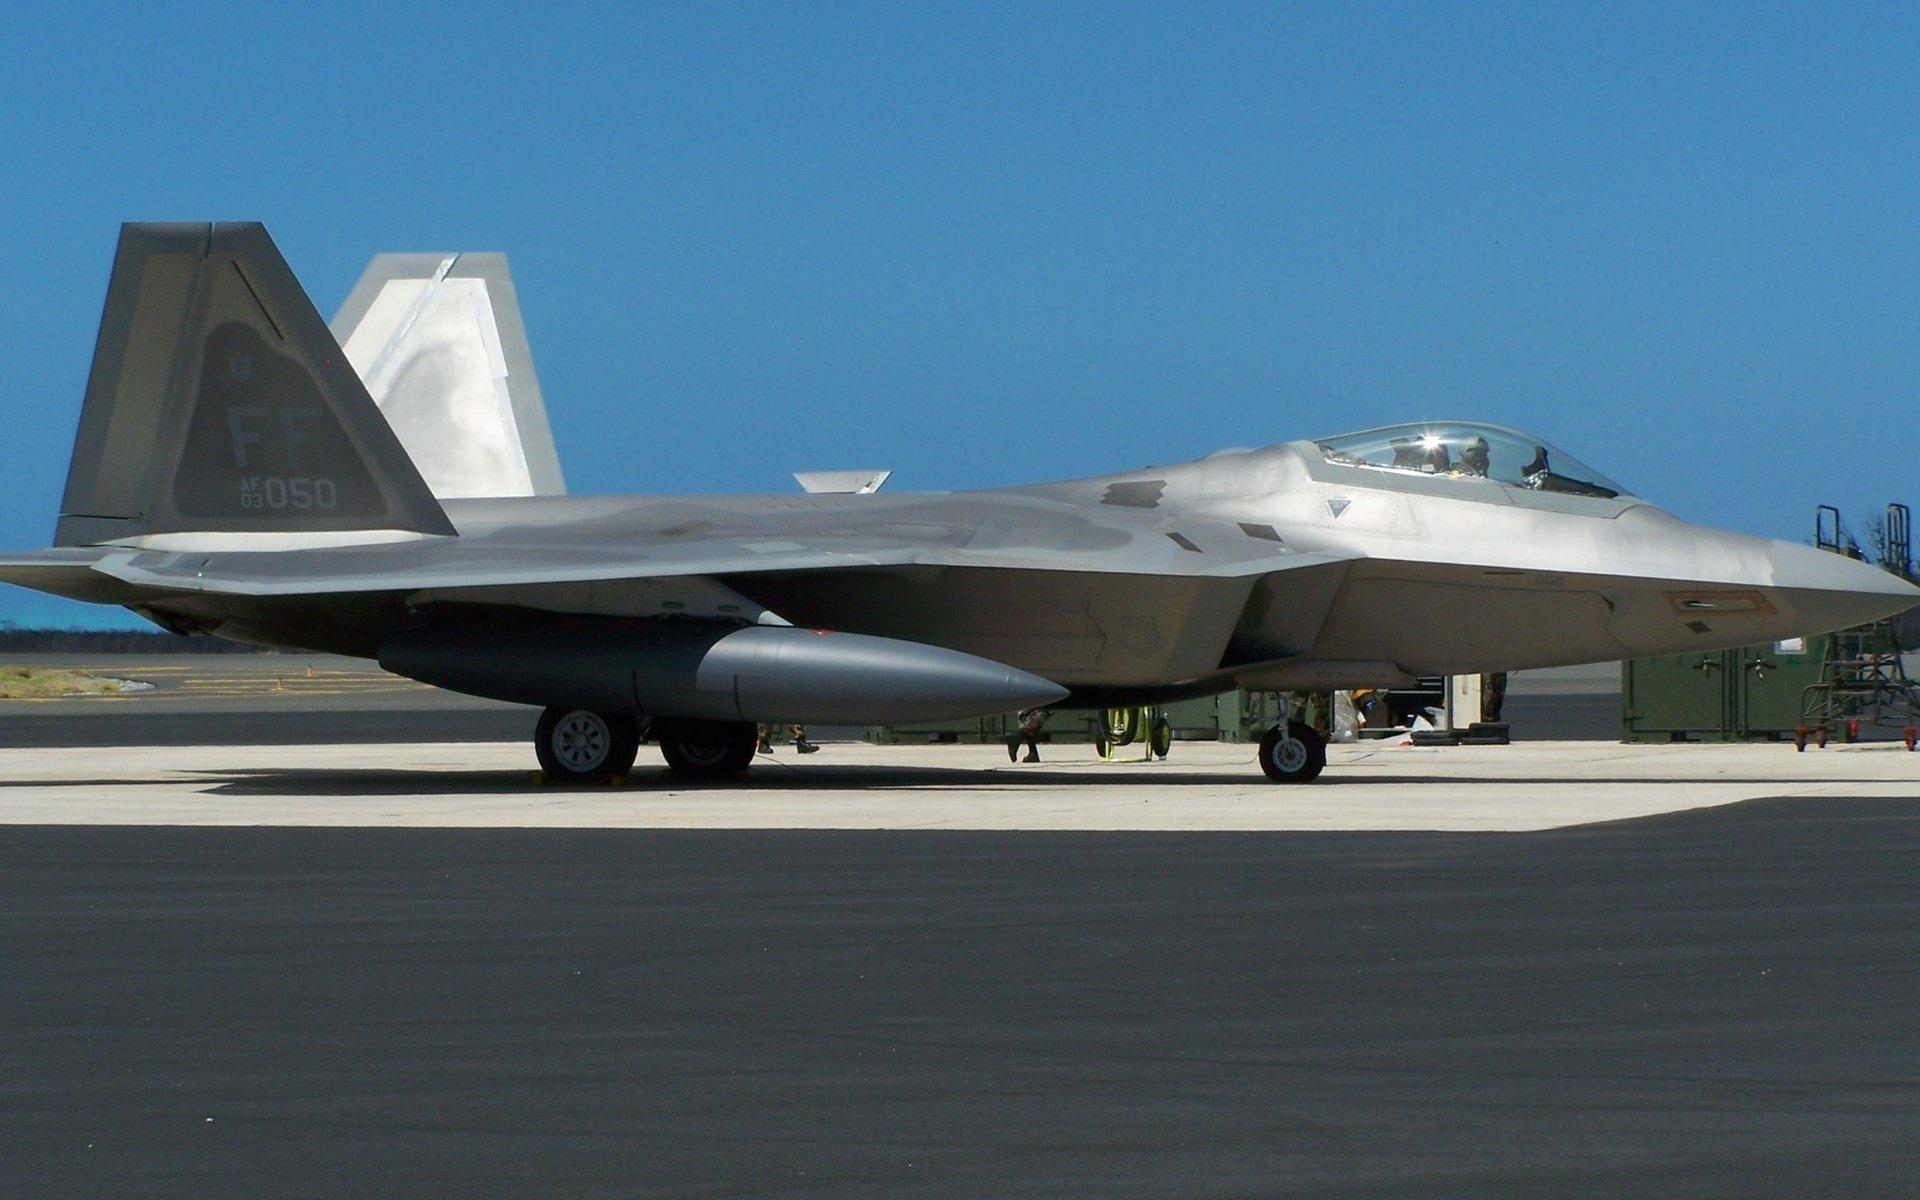 Best Lockheed Martin F 22 Raptor Wallpaper Id 446228 For High Resolution Hd 1920x1200 Pc